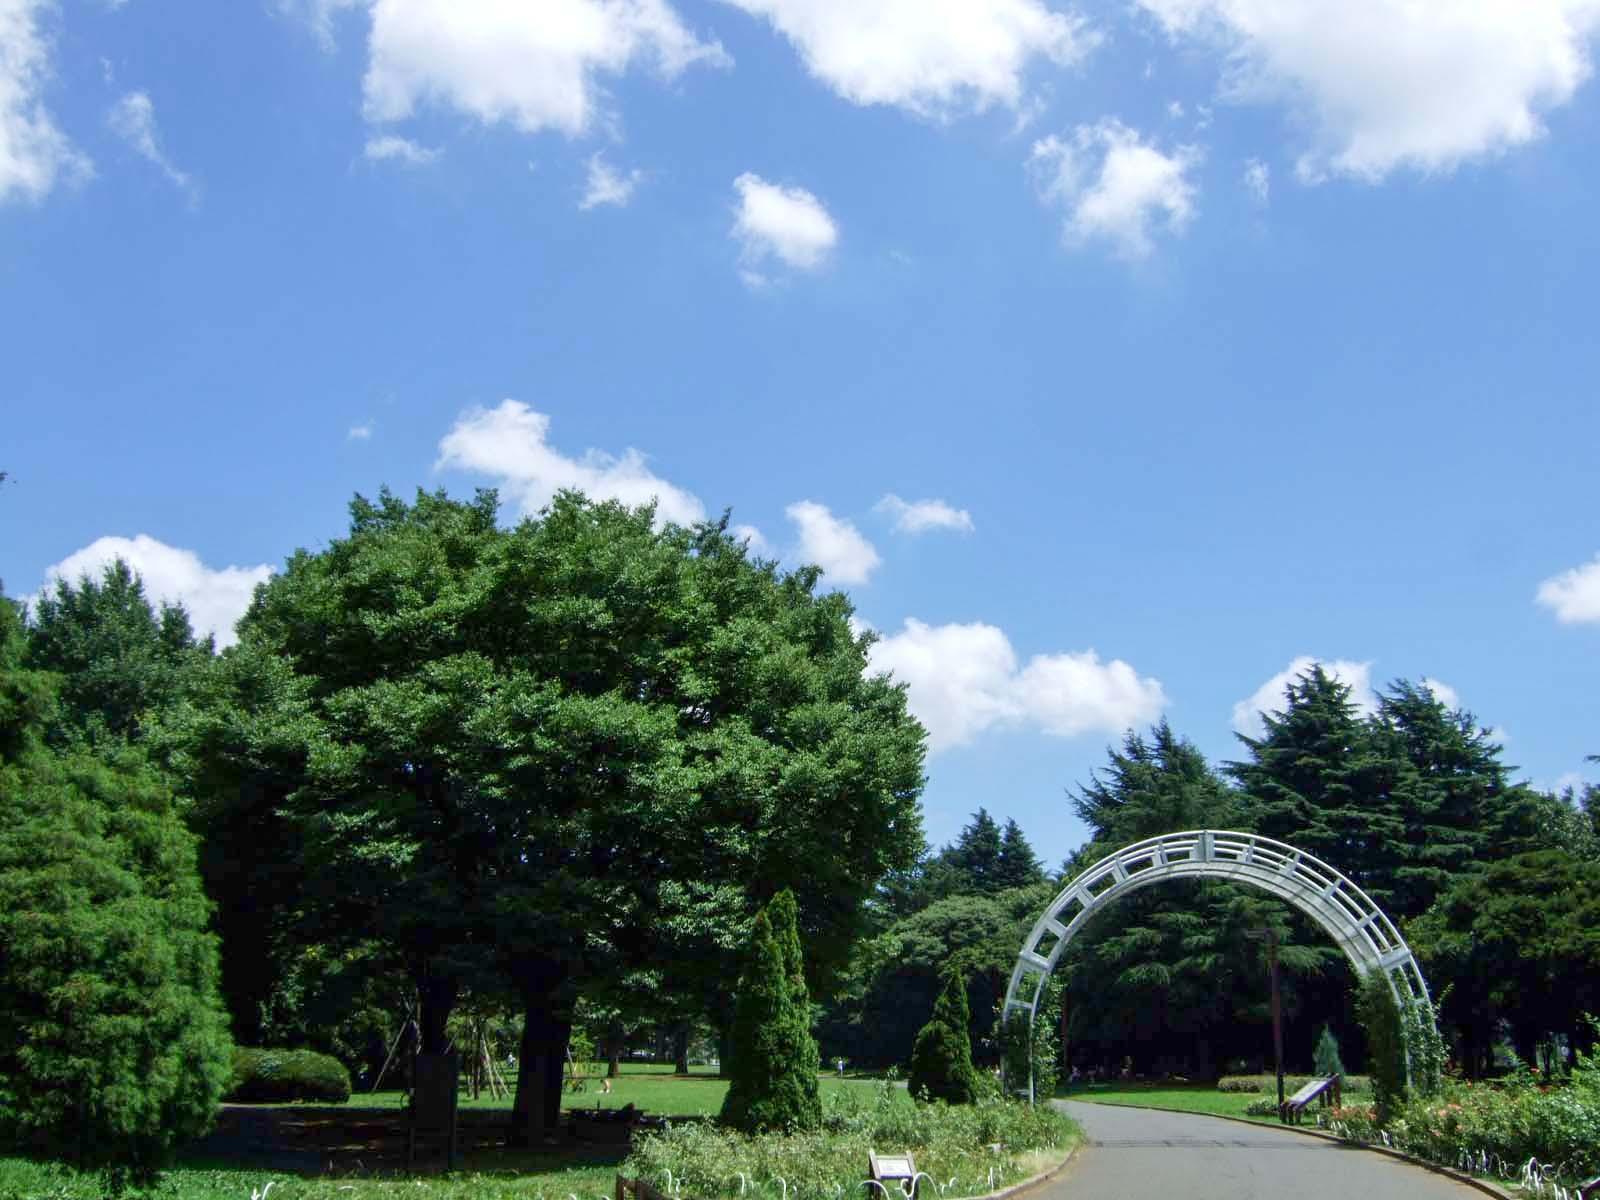 森林,盛夏,真夏,代々木公園,空,雲,アーチゲート〈著作権フリー無料画像〉Free Stock Photos